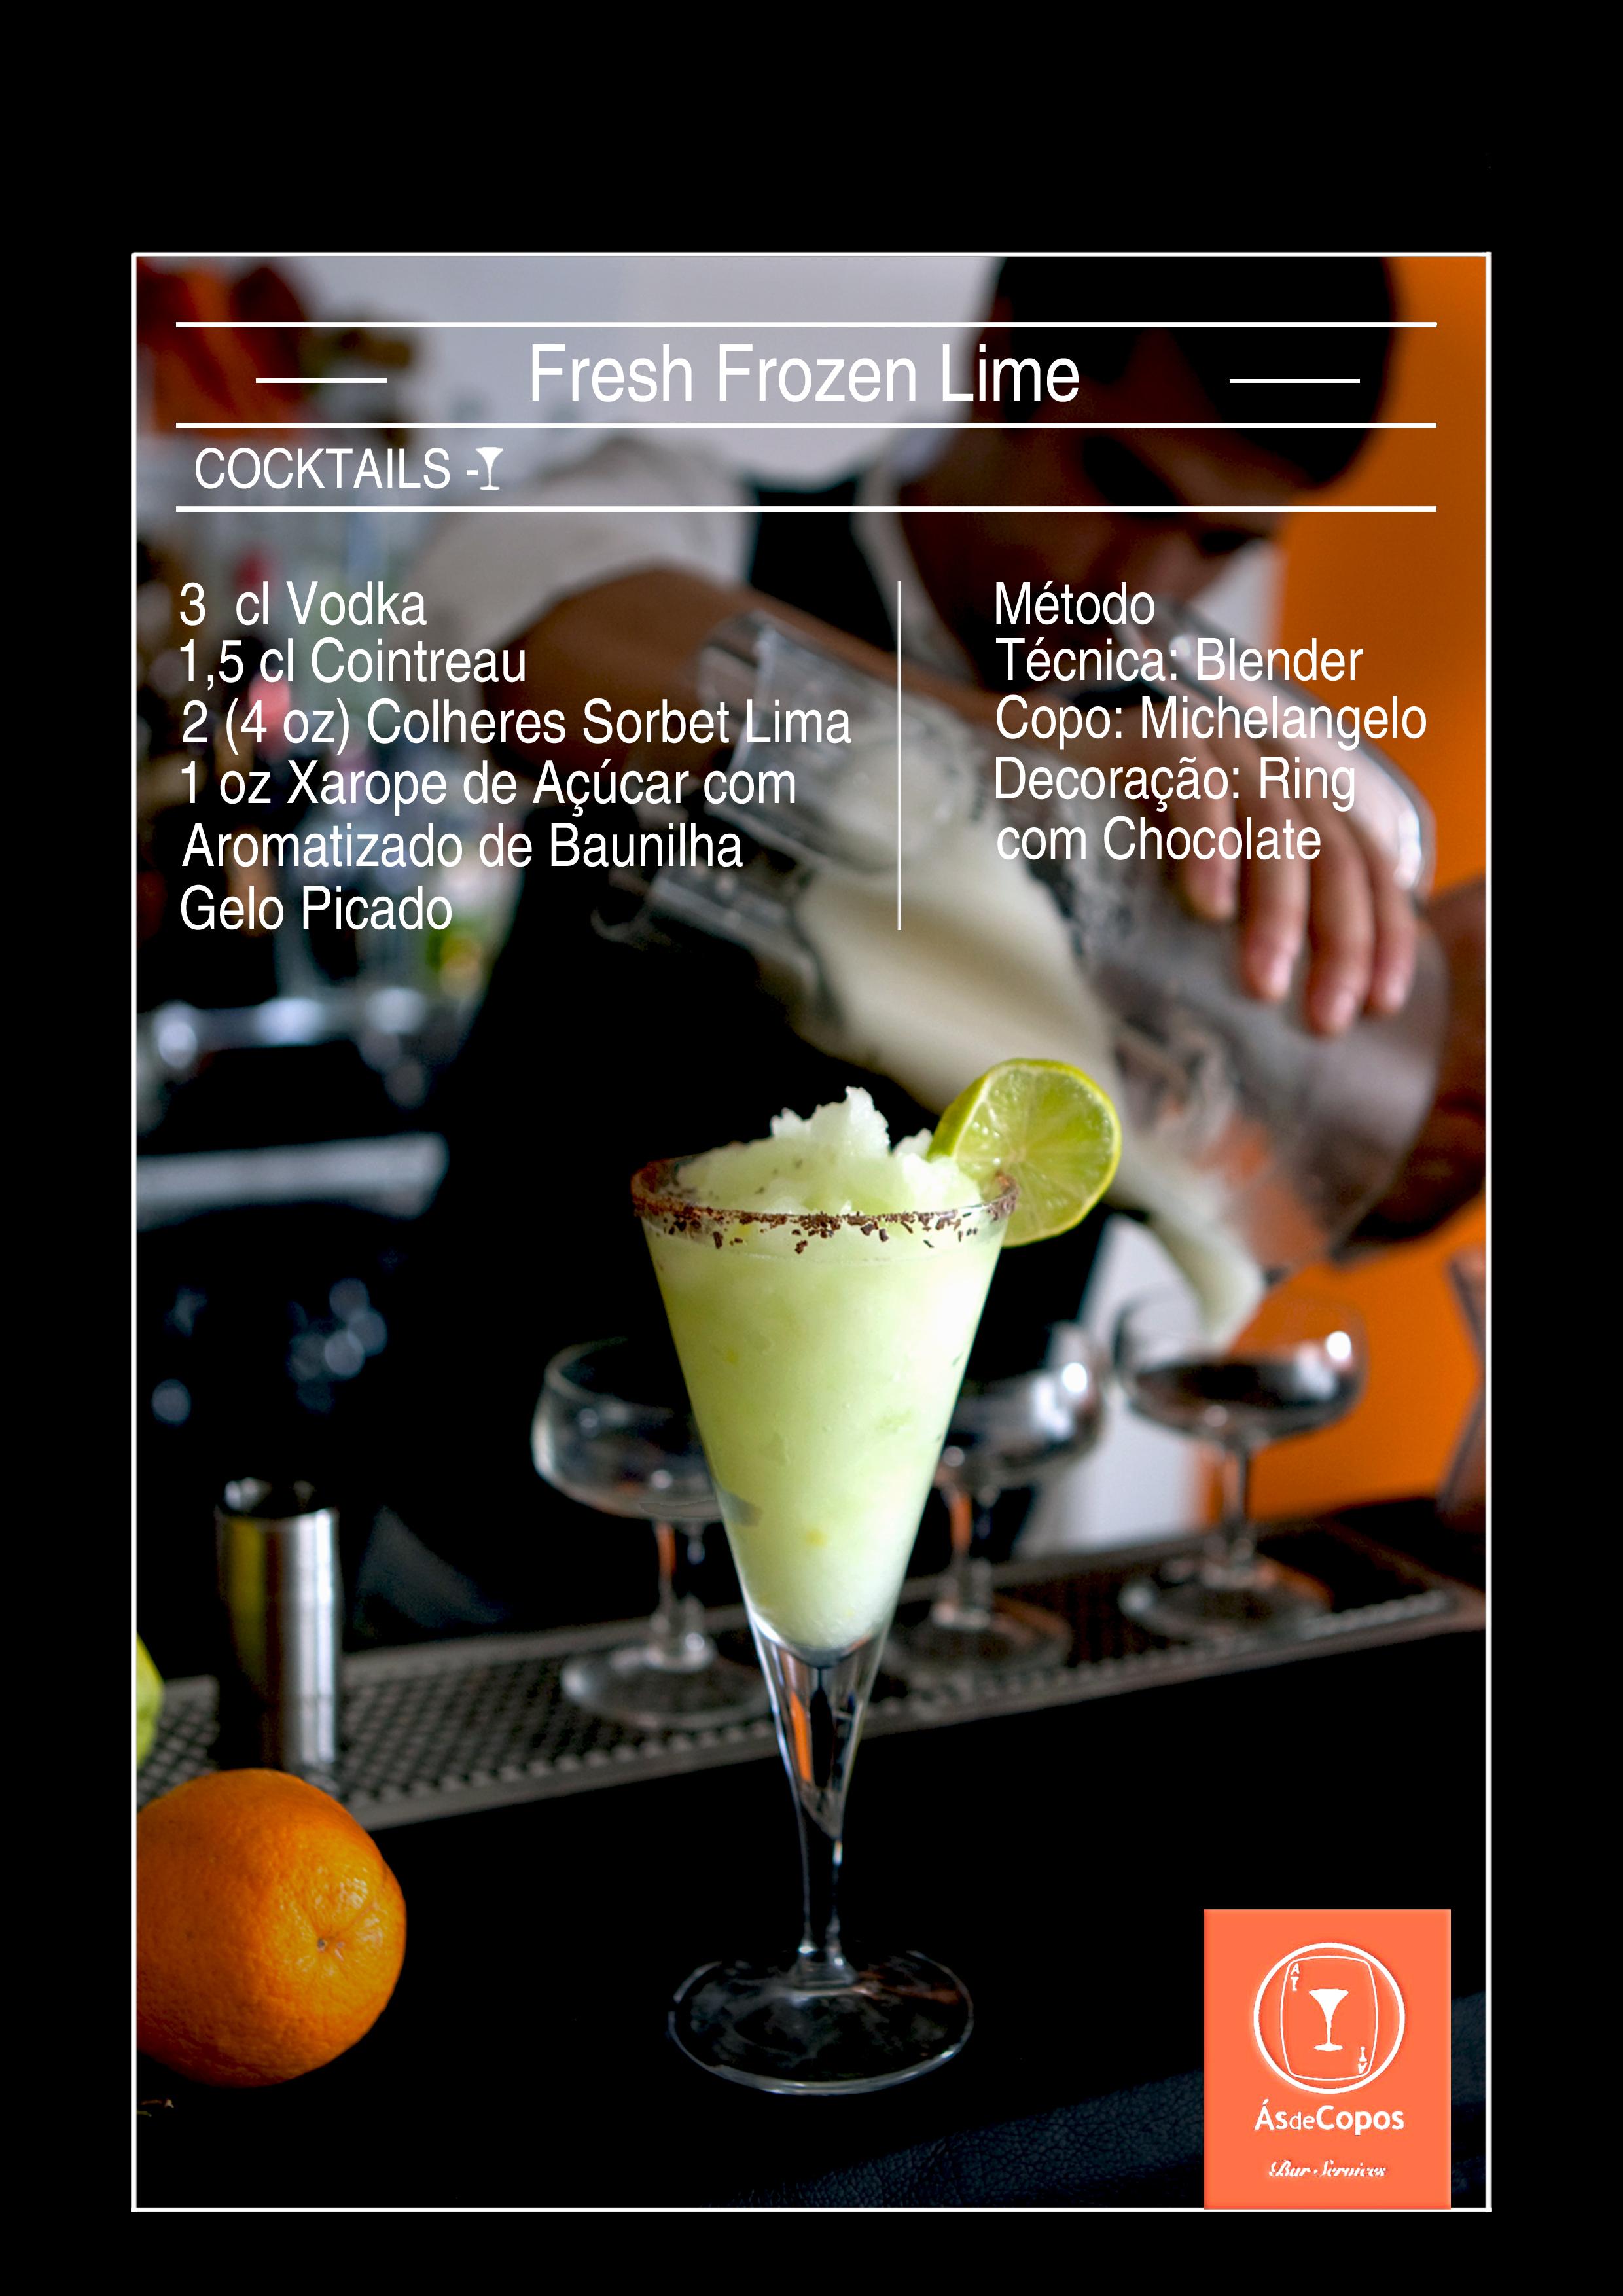 Fresh Frozen lime